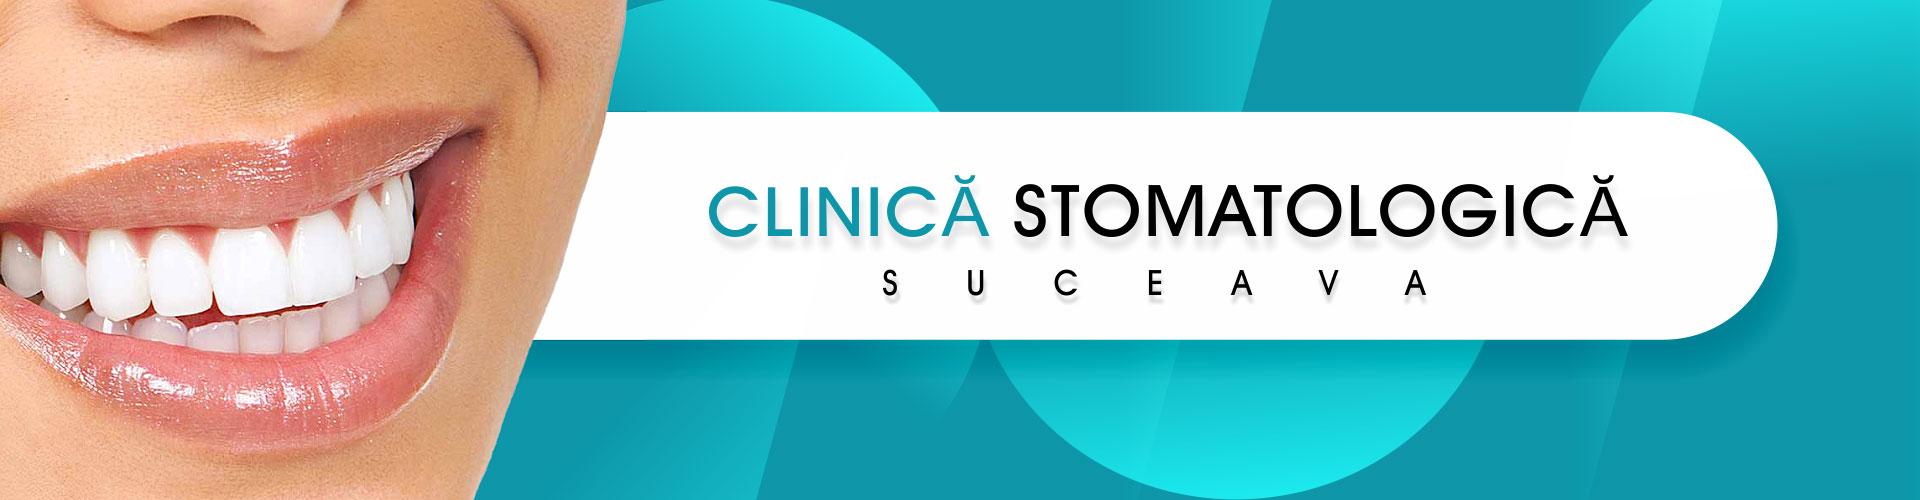 Clinica Stomatologica Suceava